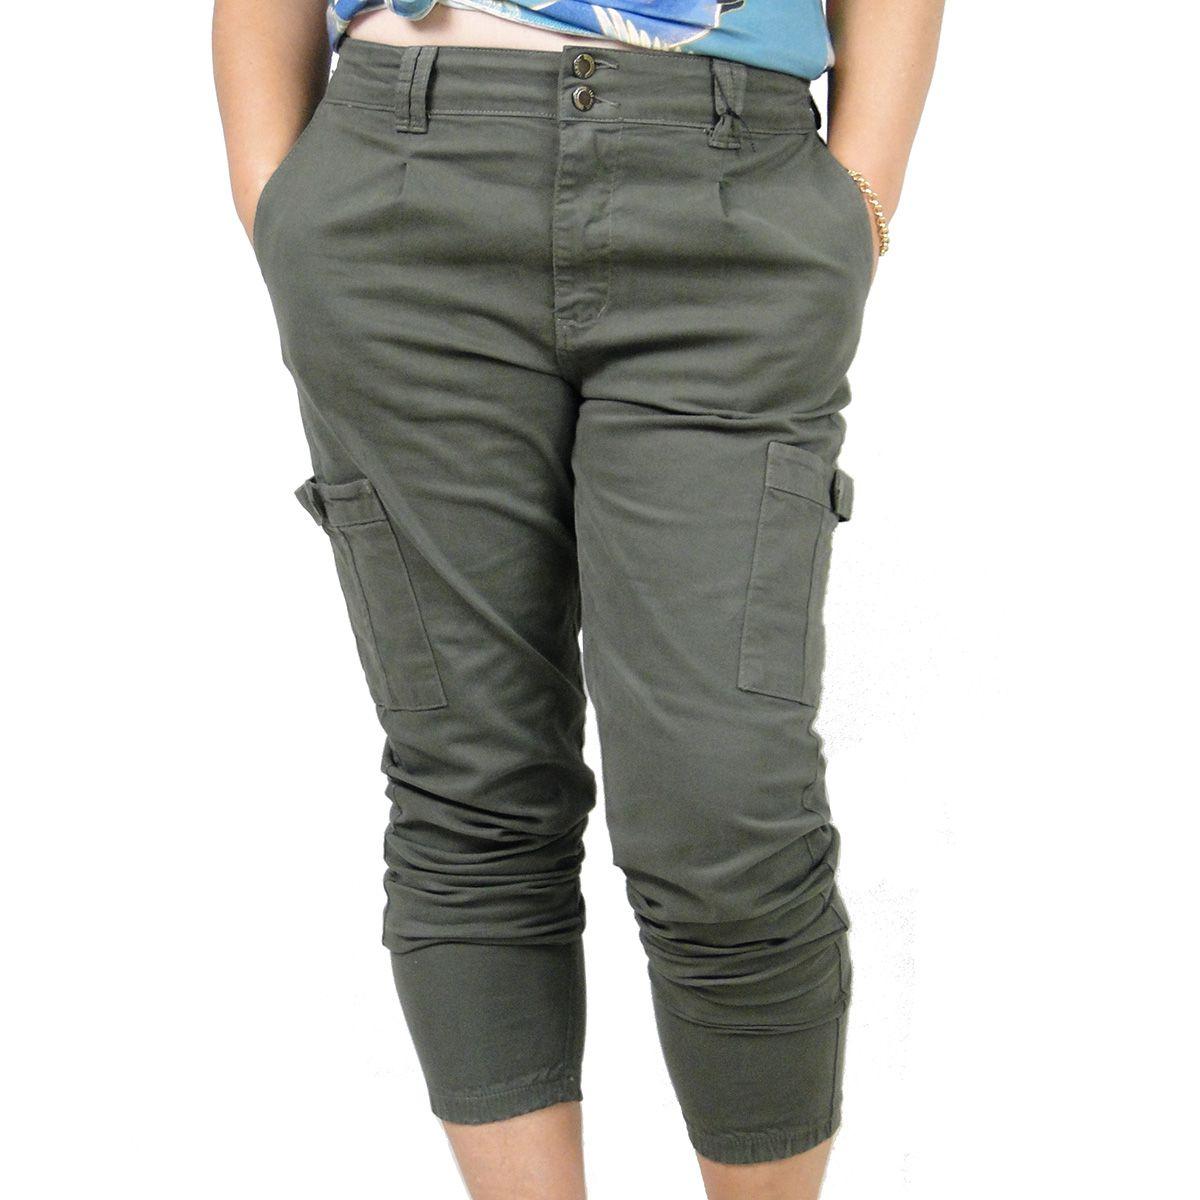 Calça Lenis Feminina Jeans Jogger Verde